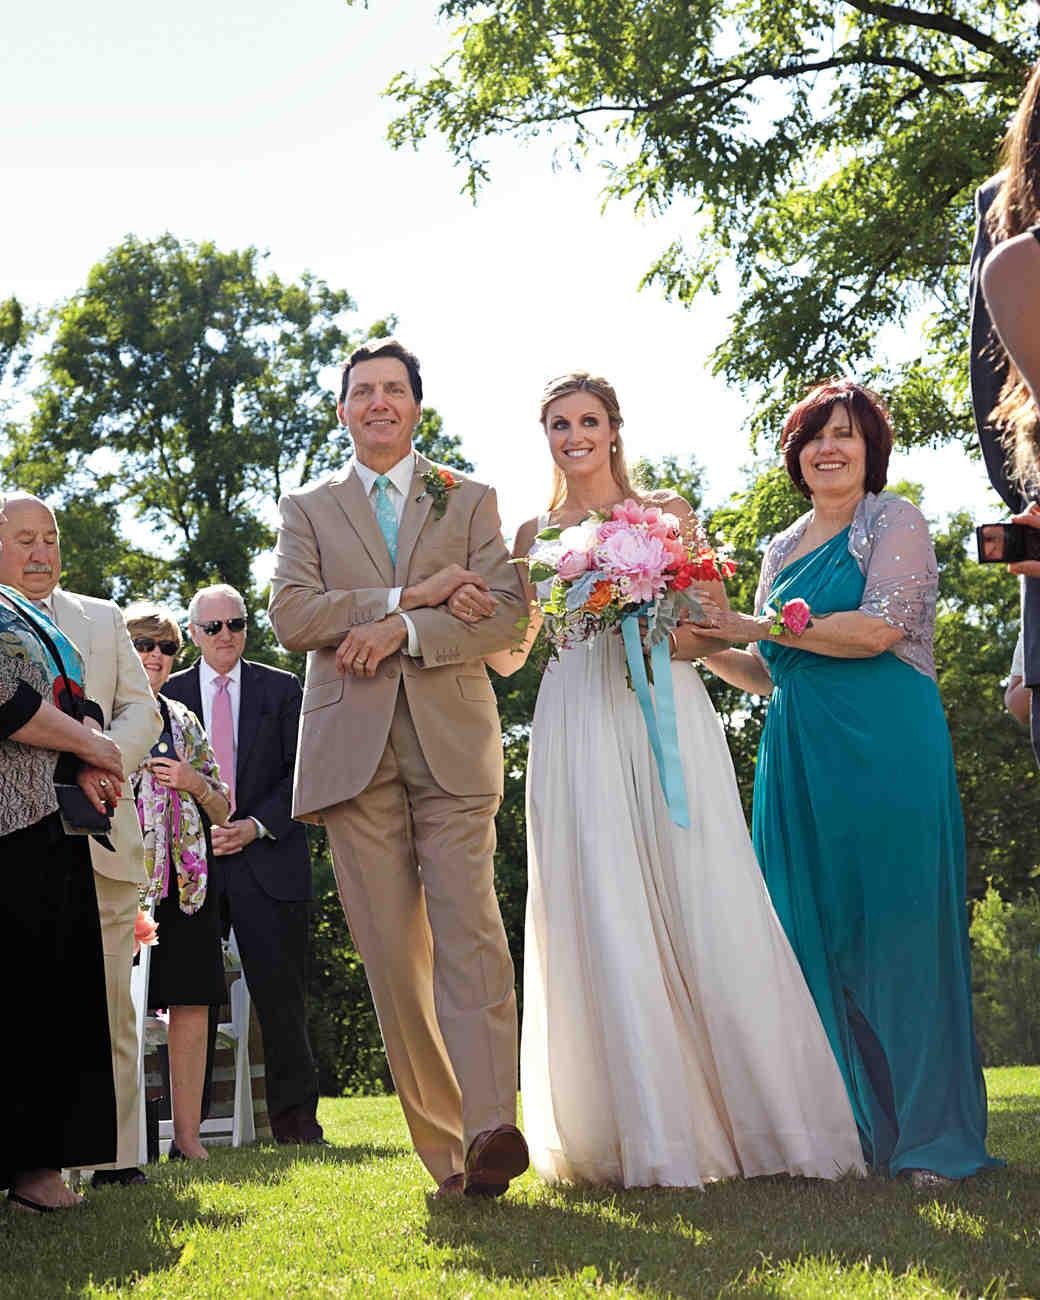 leanna-matt-wedding-1649-s111371.jpg